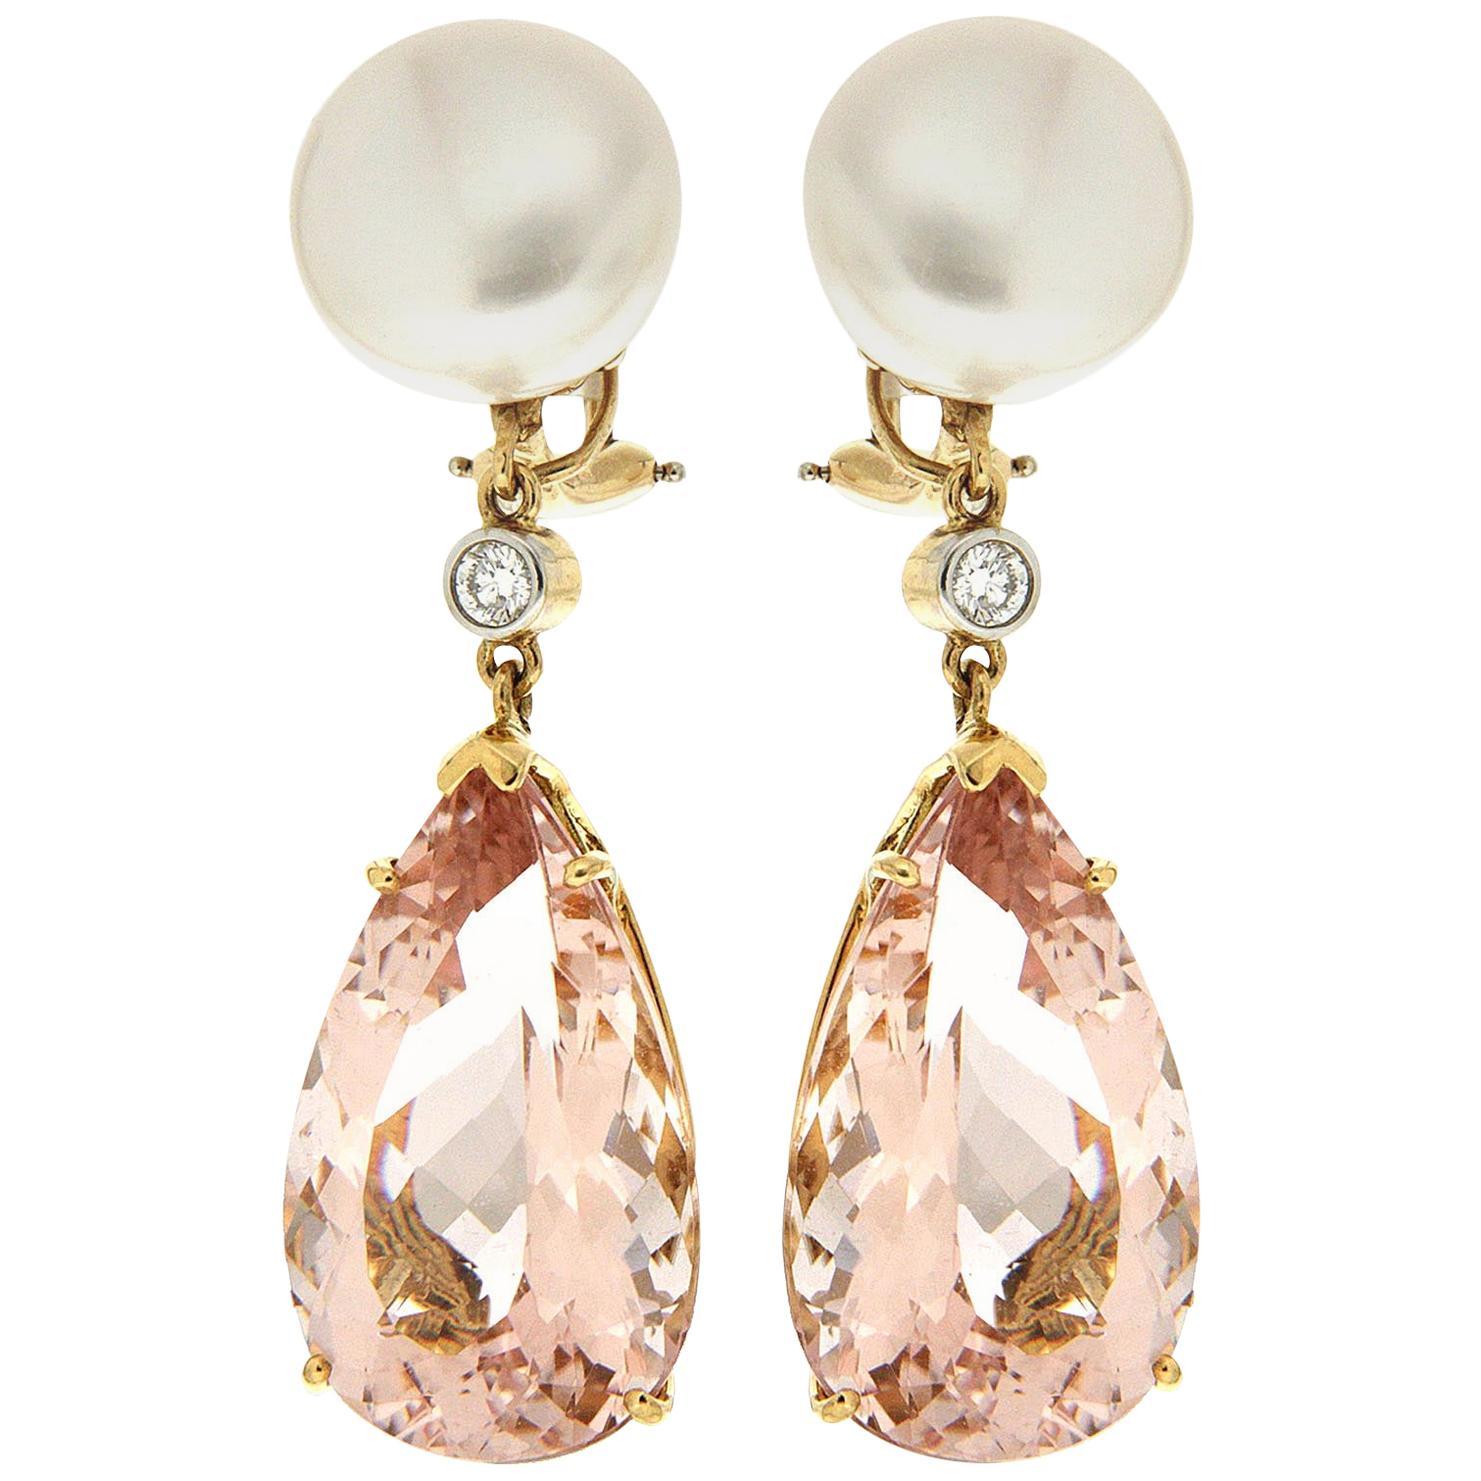 Valentin Magro Pearl Morganite Drop Earrings